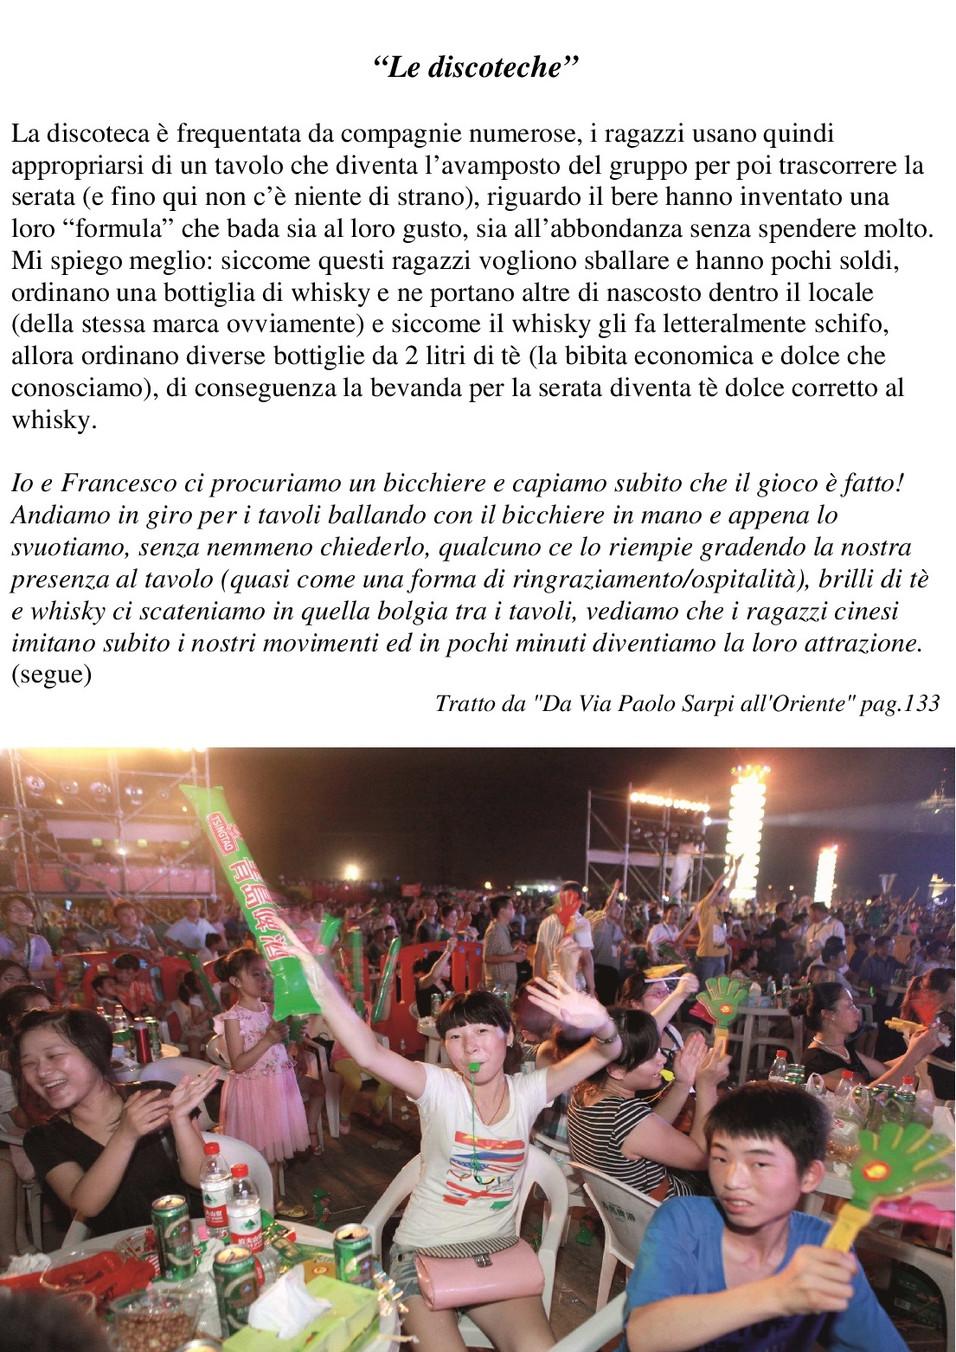 12 Poster Le discoteche.jpg